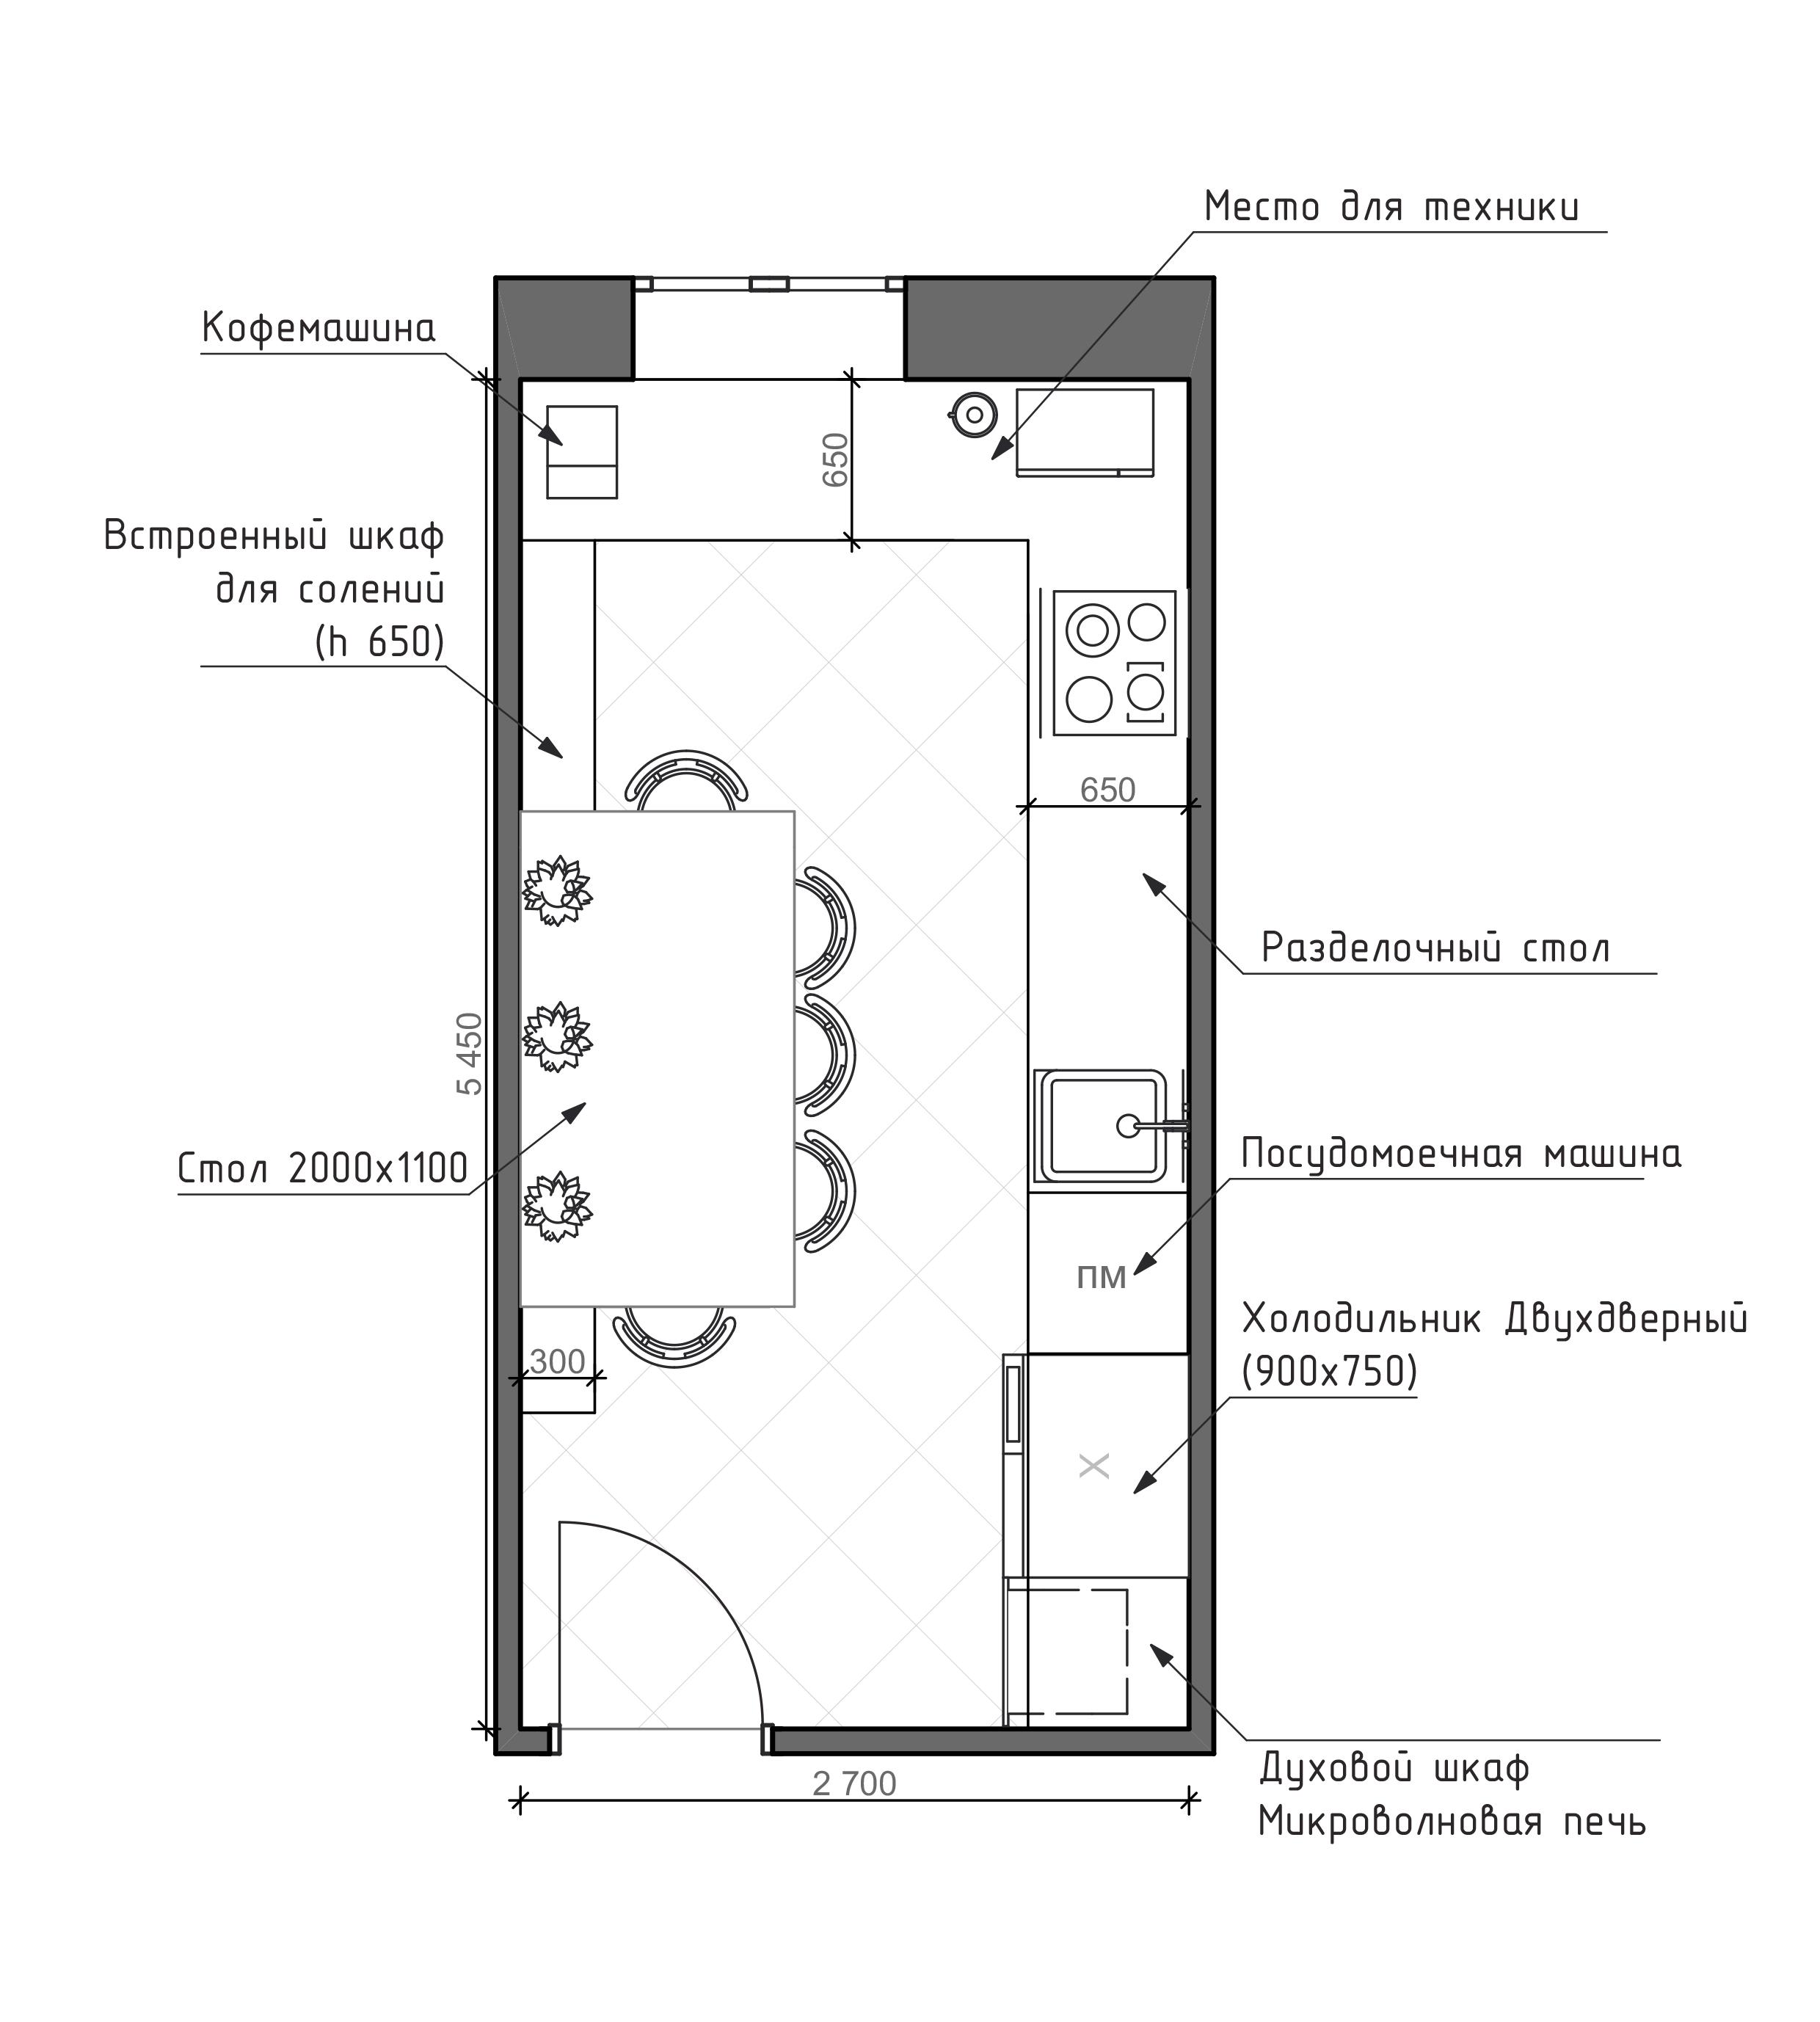 Дизайн кухни фото f_468587805ab7b3ef.jpg